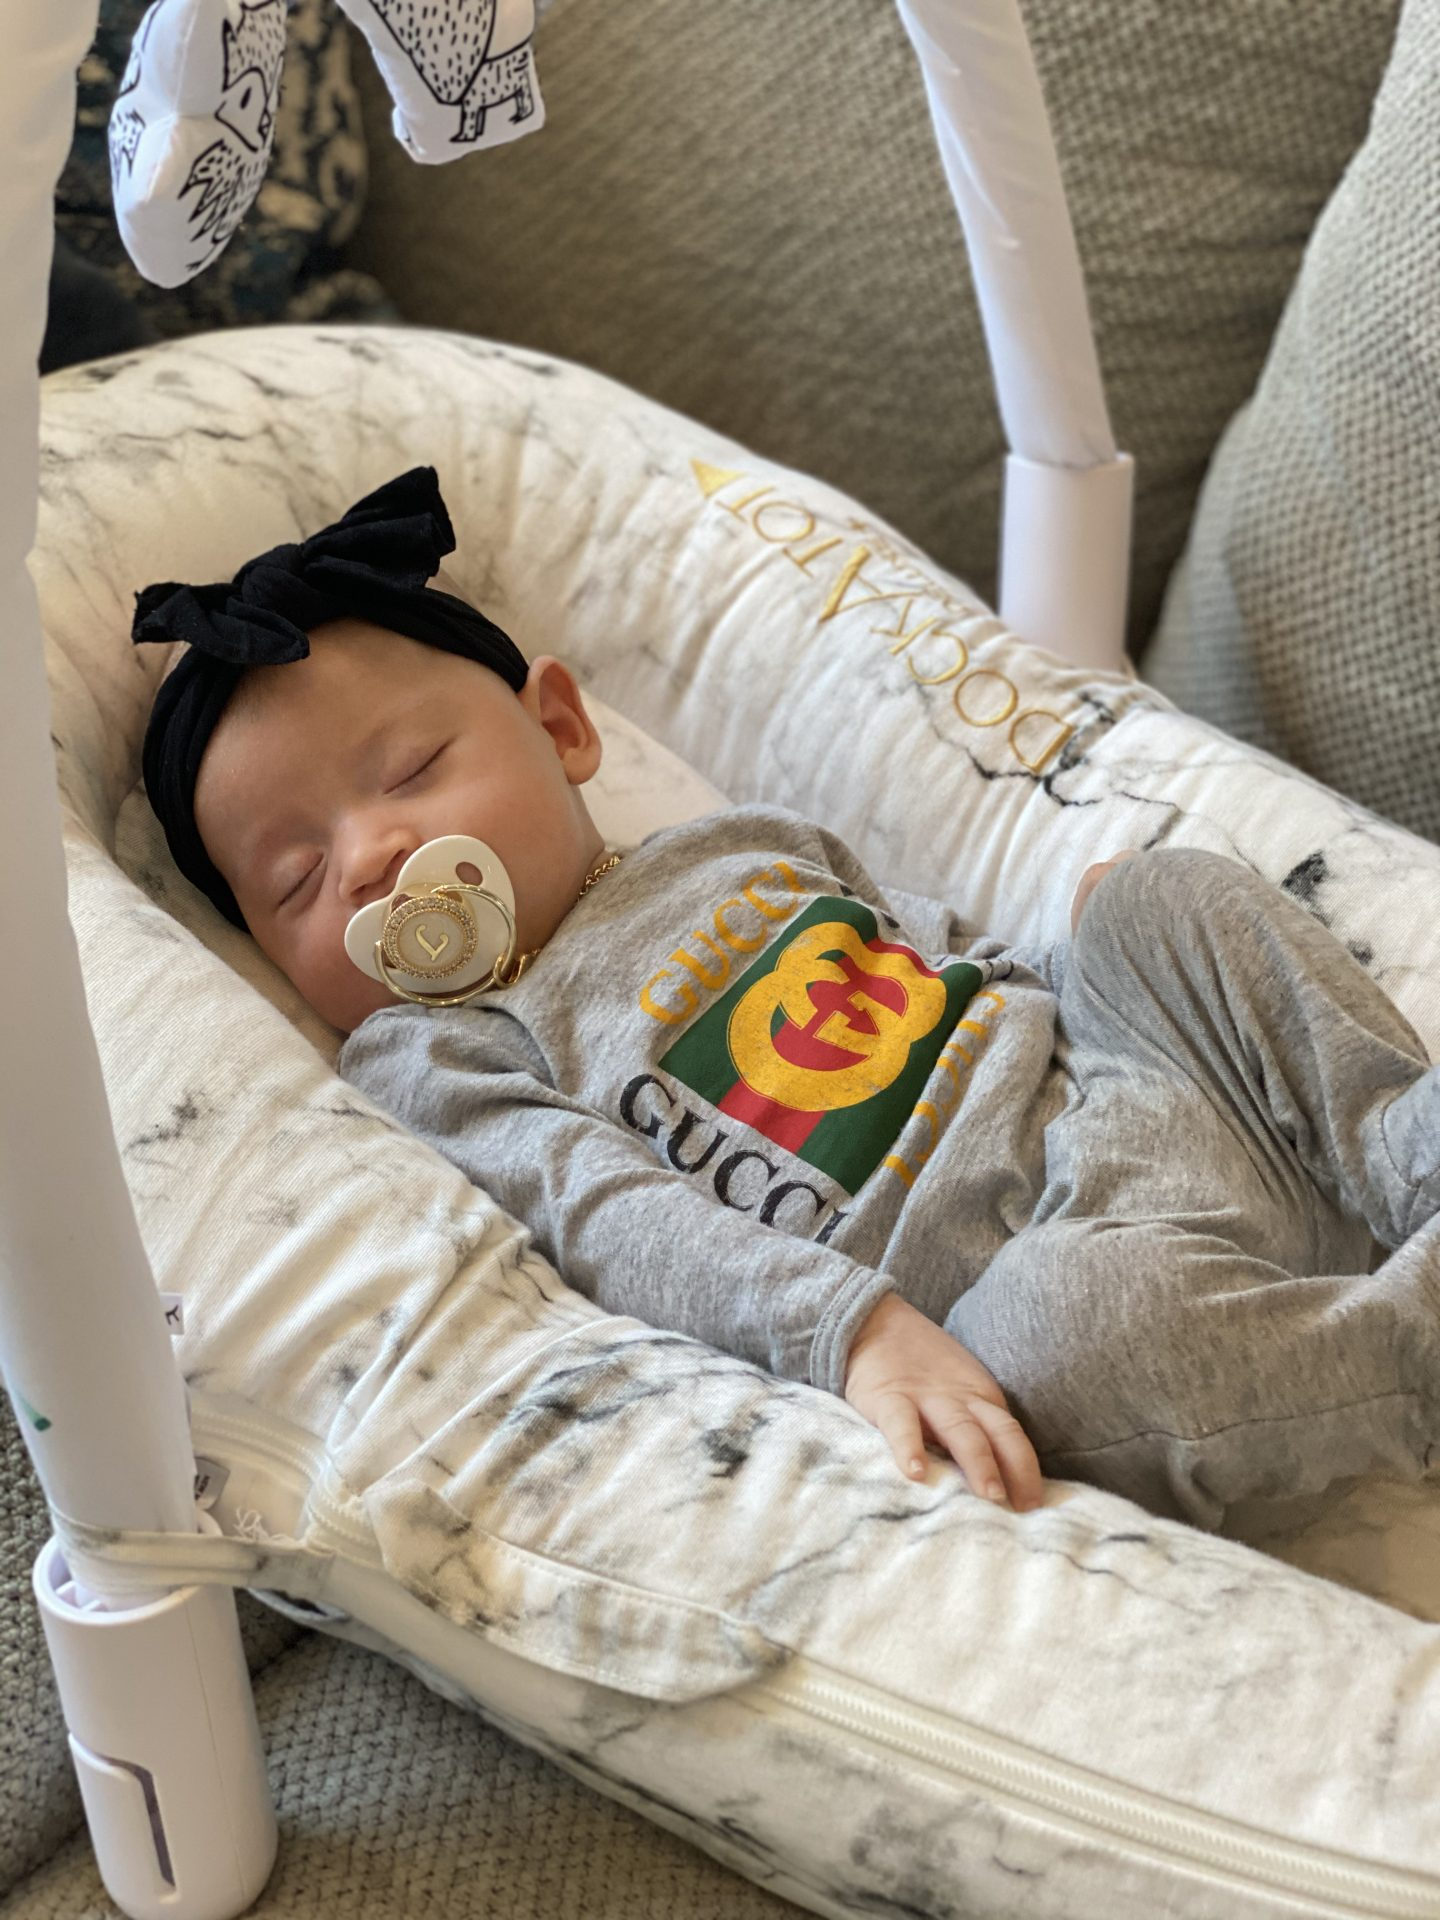 baby items, baby must haves, moms favorite baby items, newborn baby, baby gear, baby items, newborn must haves, mom of two, mom blogger, mommy blogger, motherhood, Chicago mom, dock-a-tot, snoo, fisher price, doona, magic merlin suit